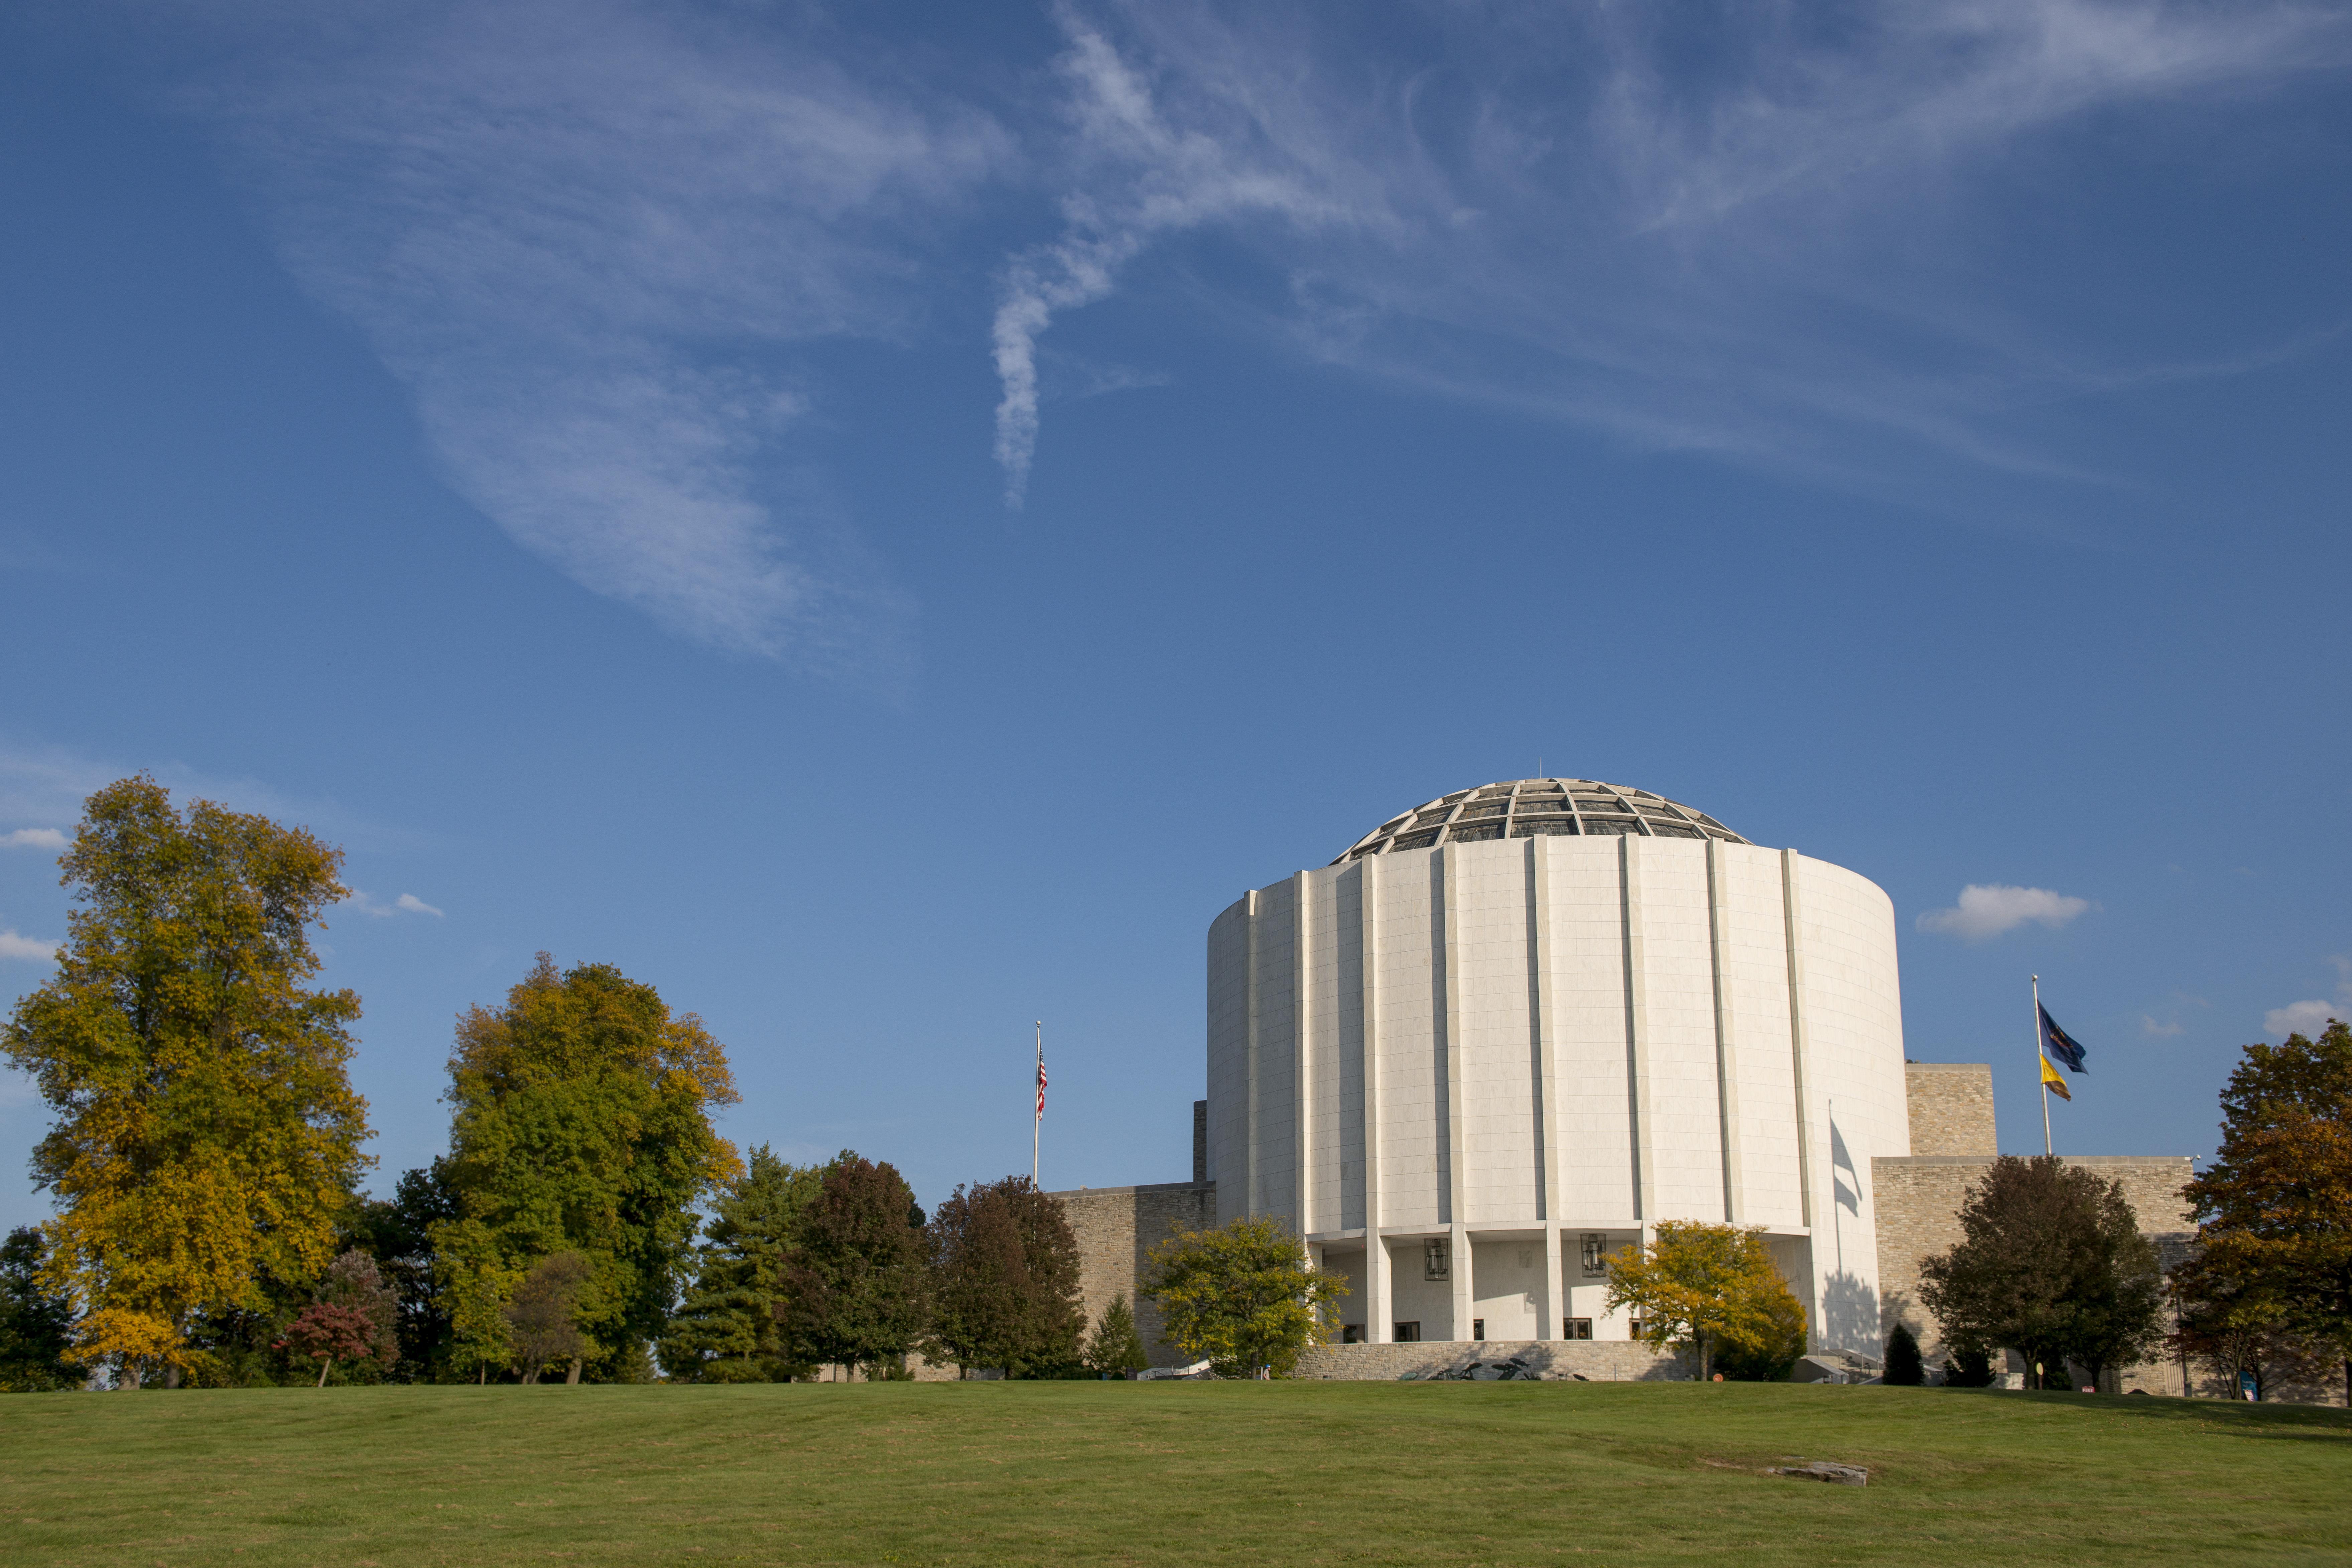 Campus buildings.